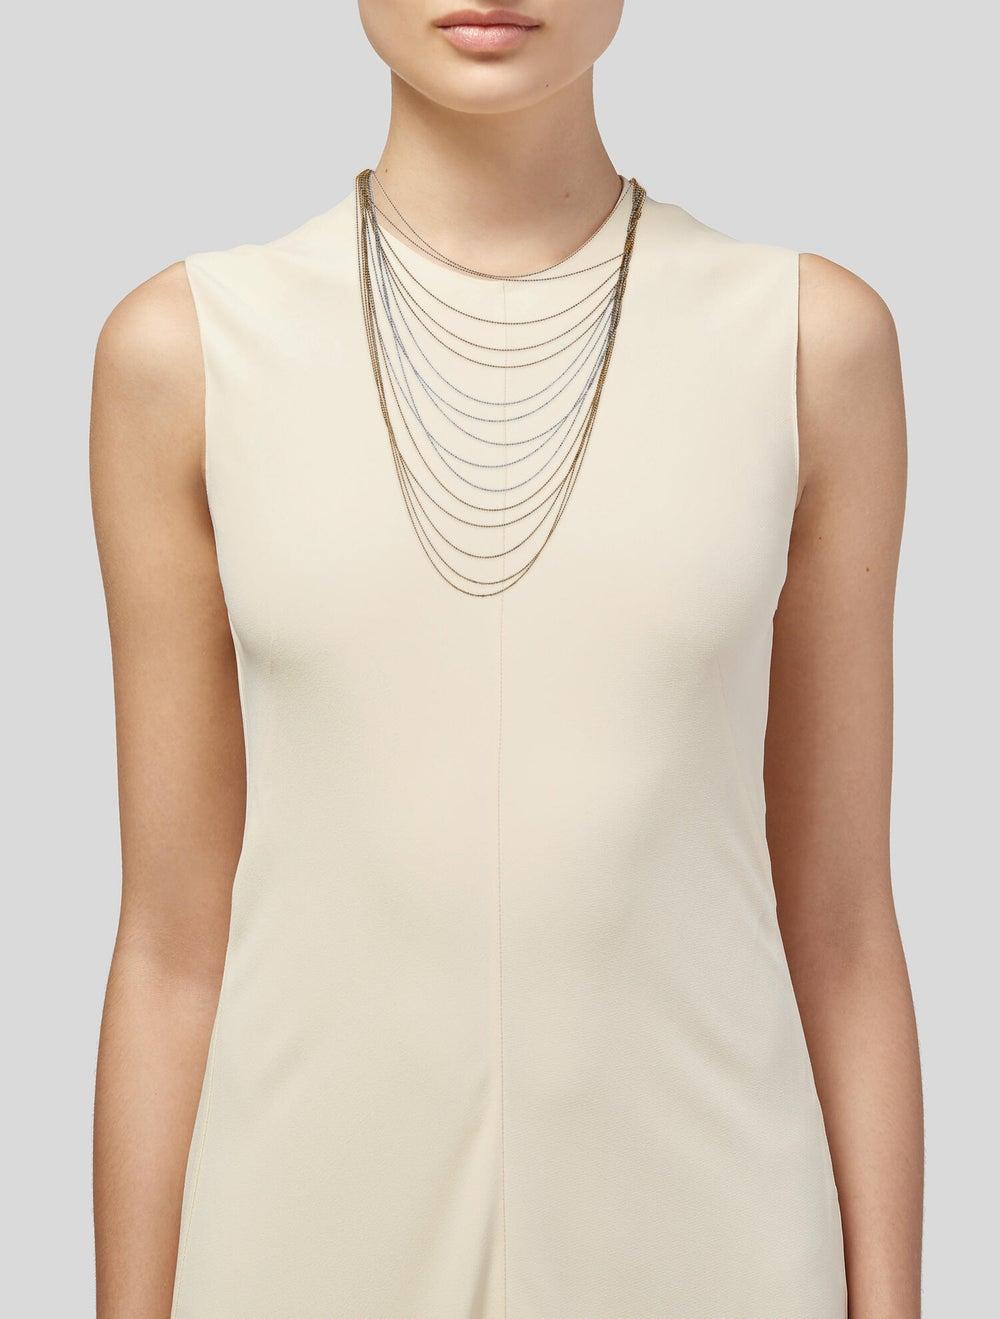 Necklace 18K Multi-Strand Chain Necklace White - image 2